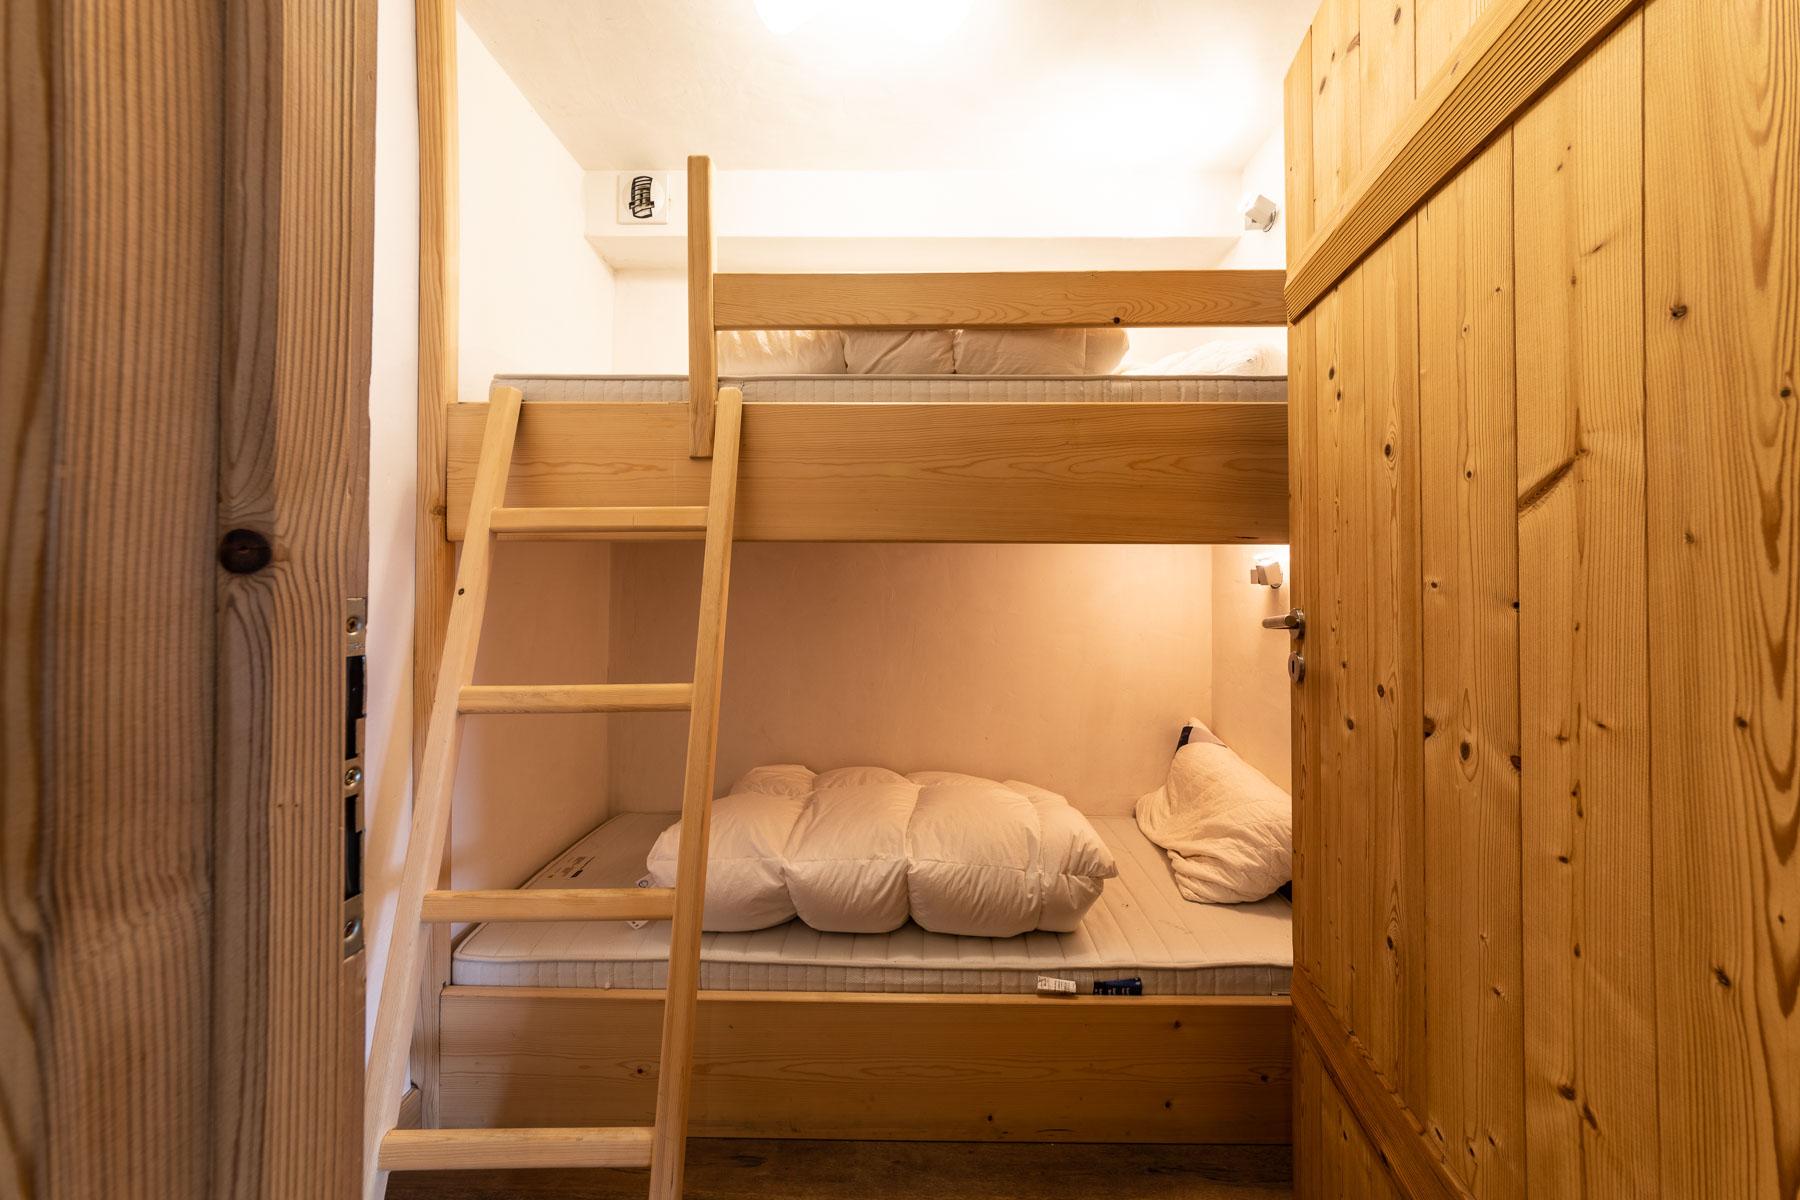 Omaroo 2 Bunk Beds